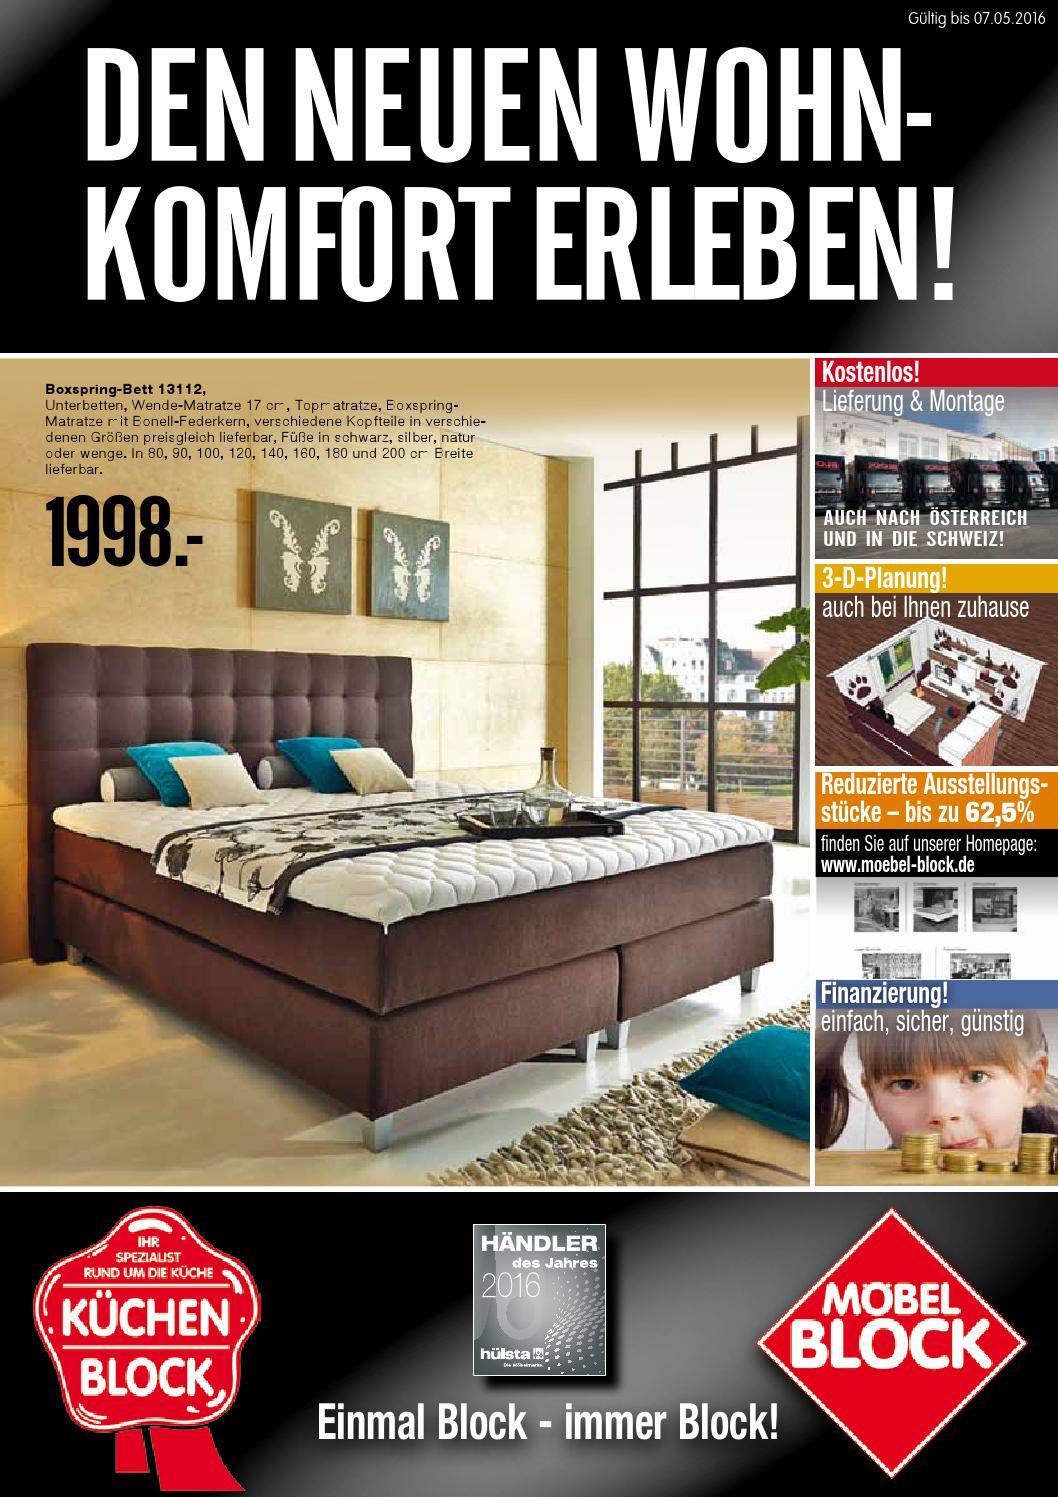 Moebel Block Kw14 By Russmedia Digital GmbH   Issuu